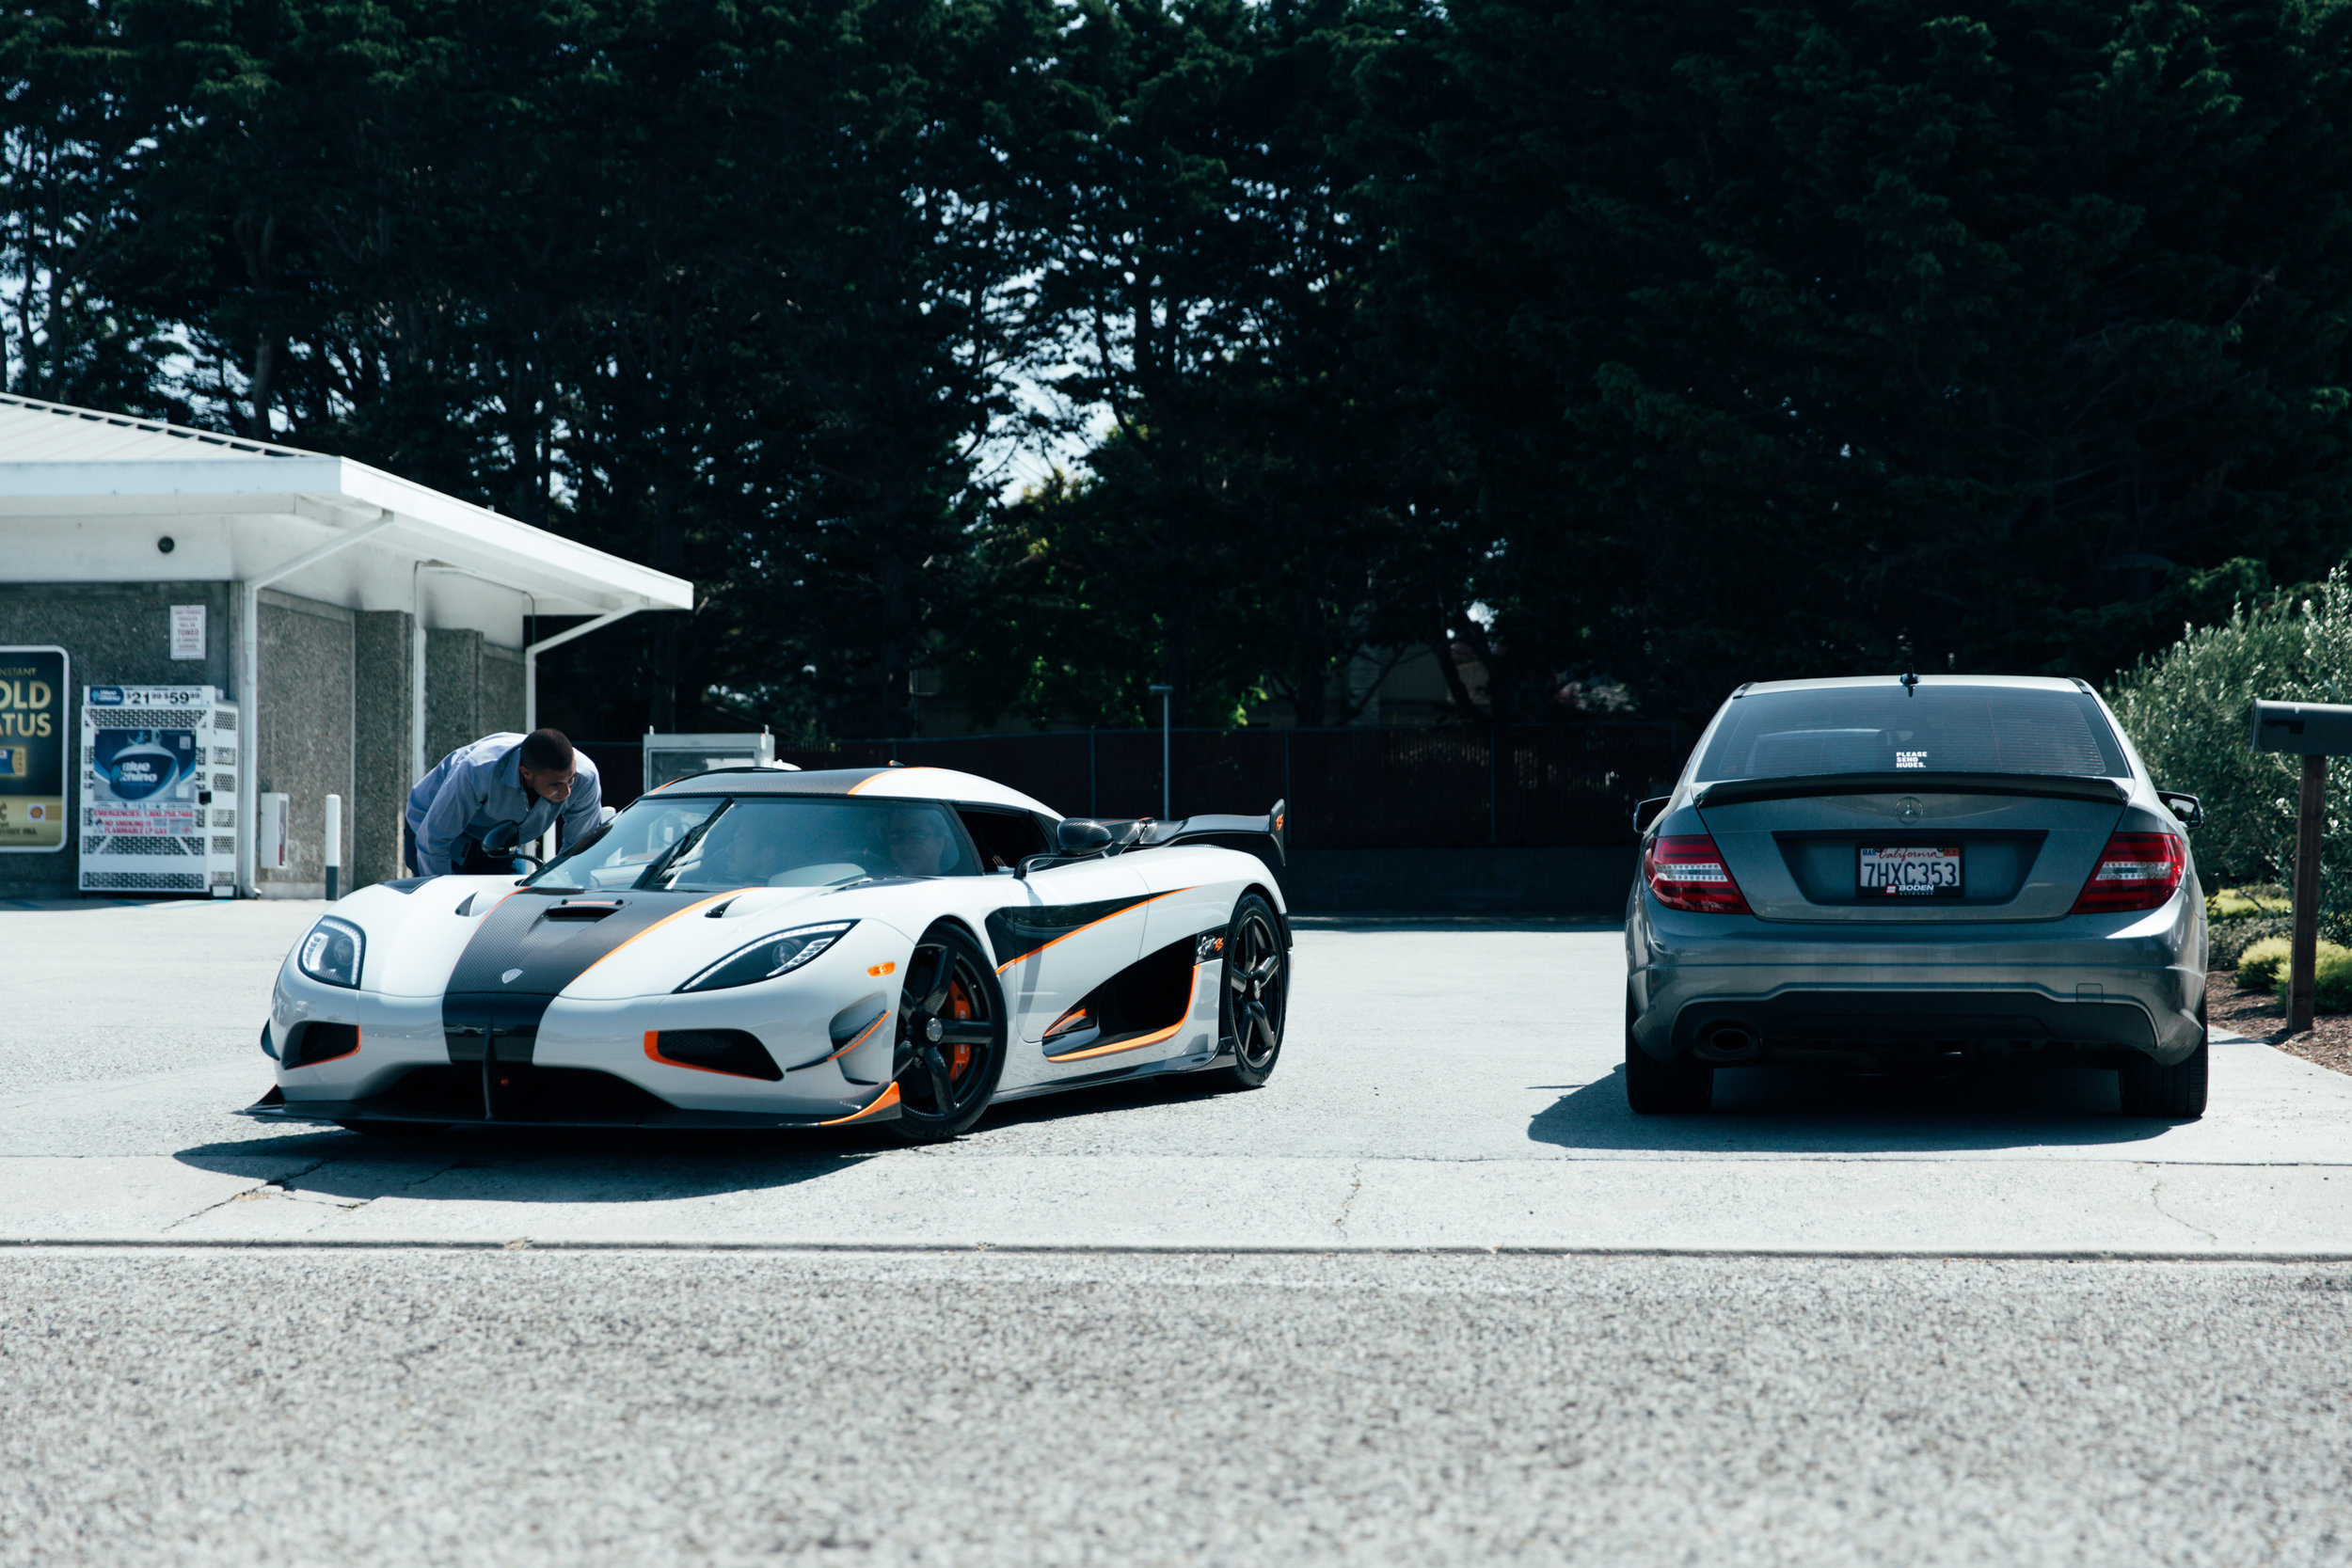 Stay_Driven_Monterey_Car_Week_Koenigsegg-72.jpg